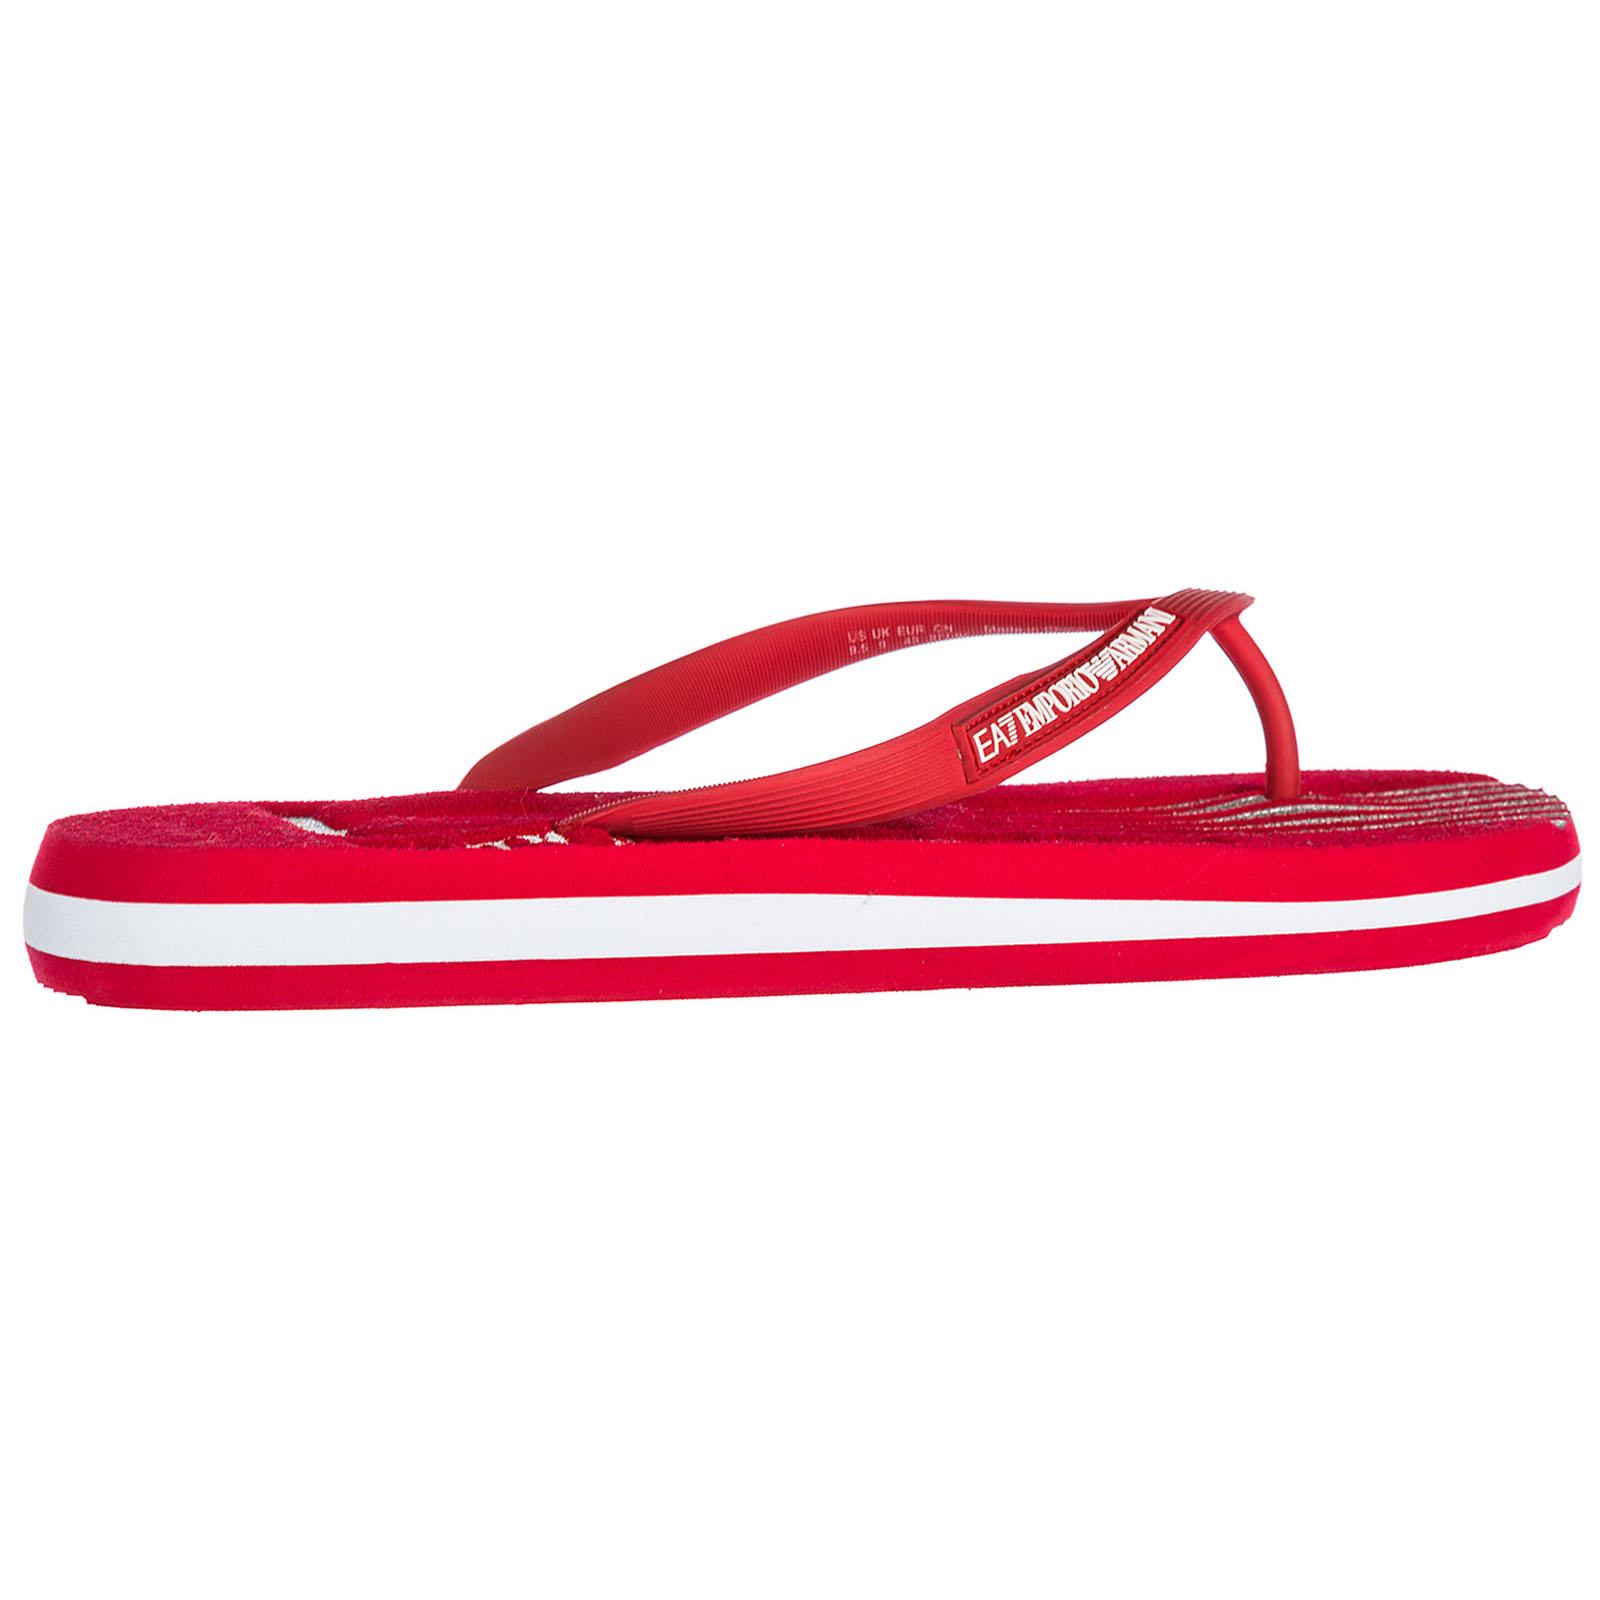 4bbc68ee1344 Emporio Armani EA7 Men s rubber flip flops sandals sea world